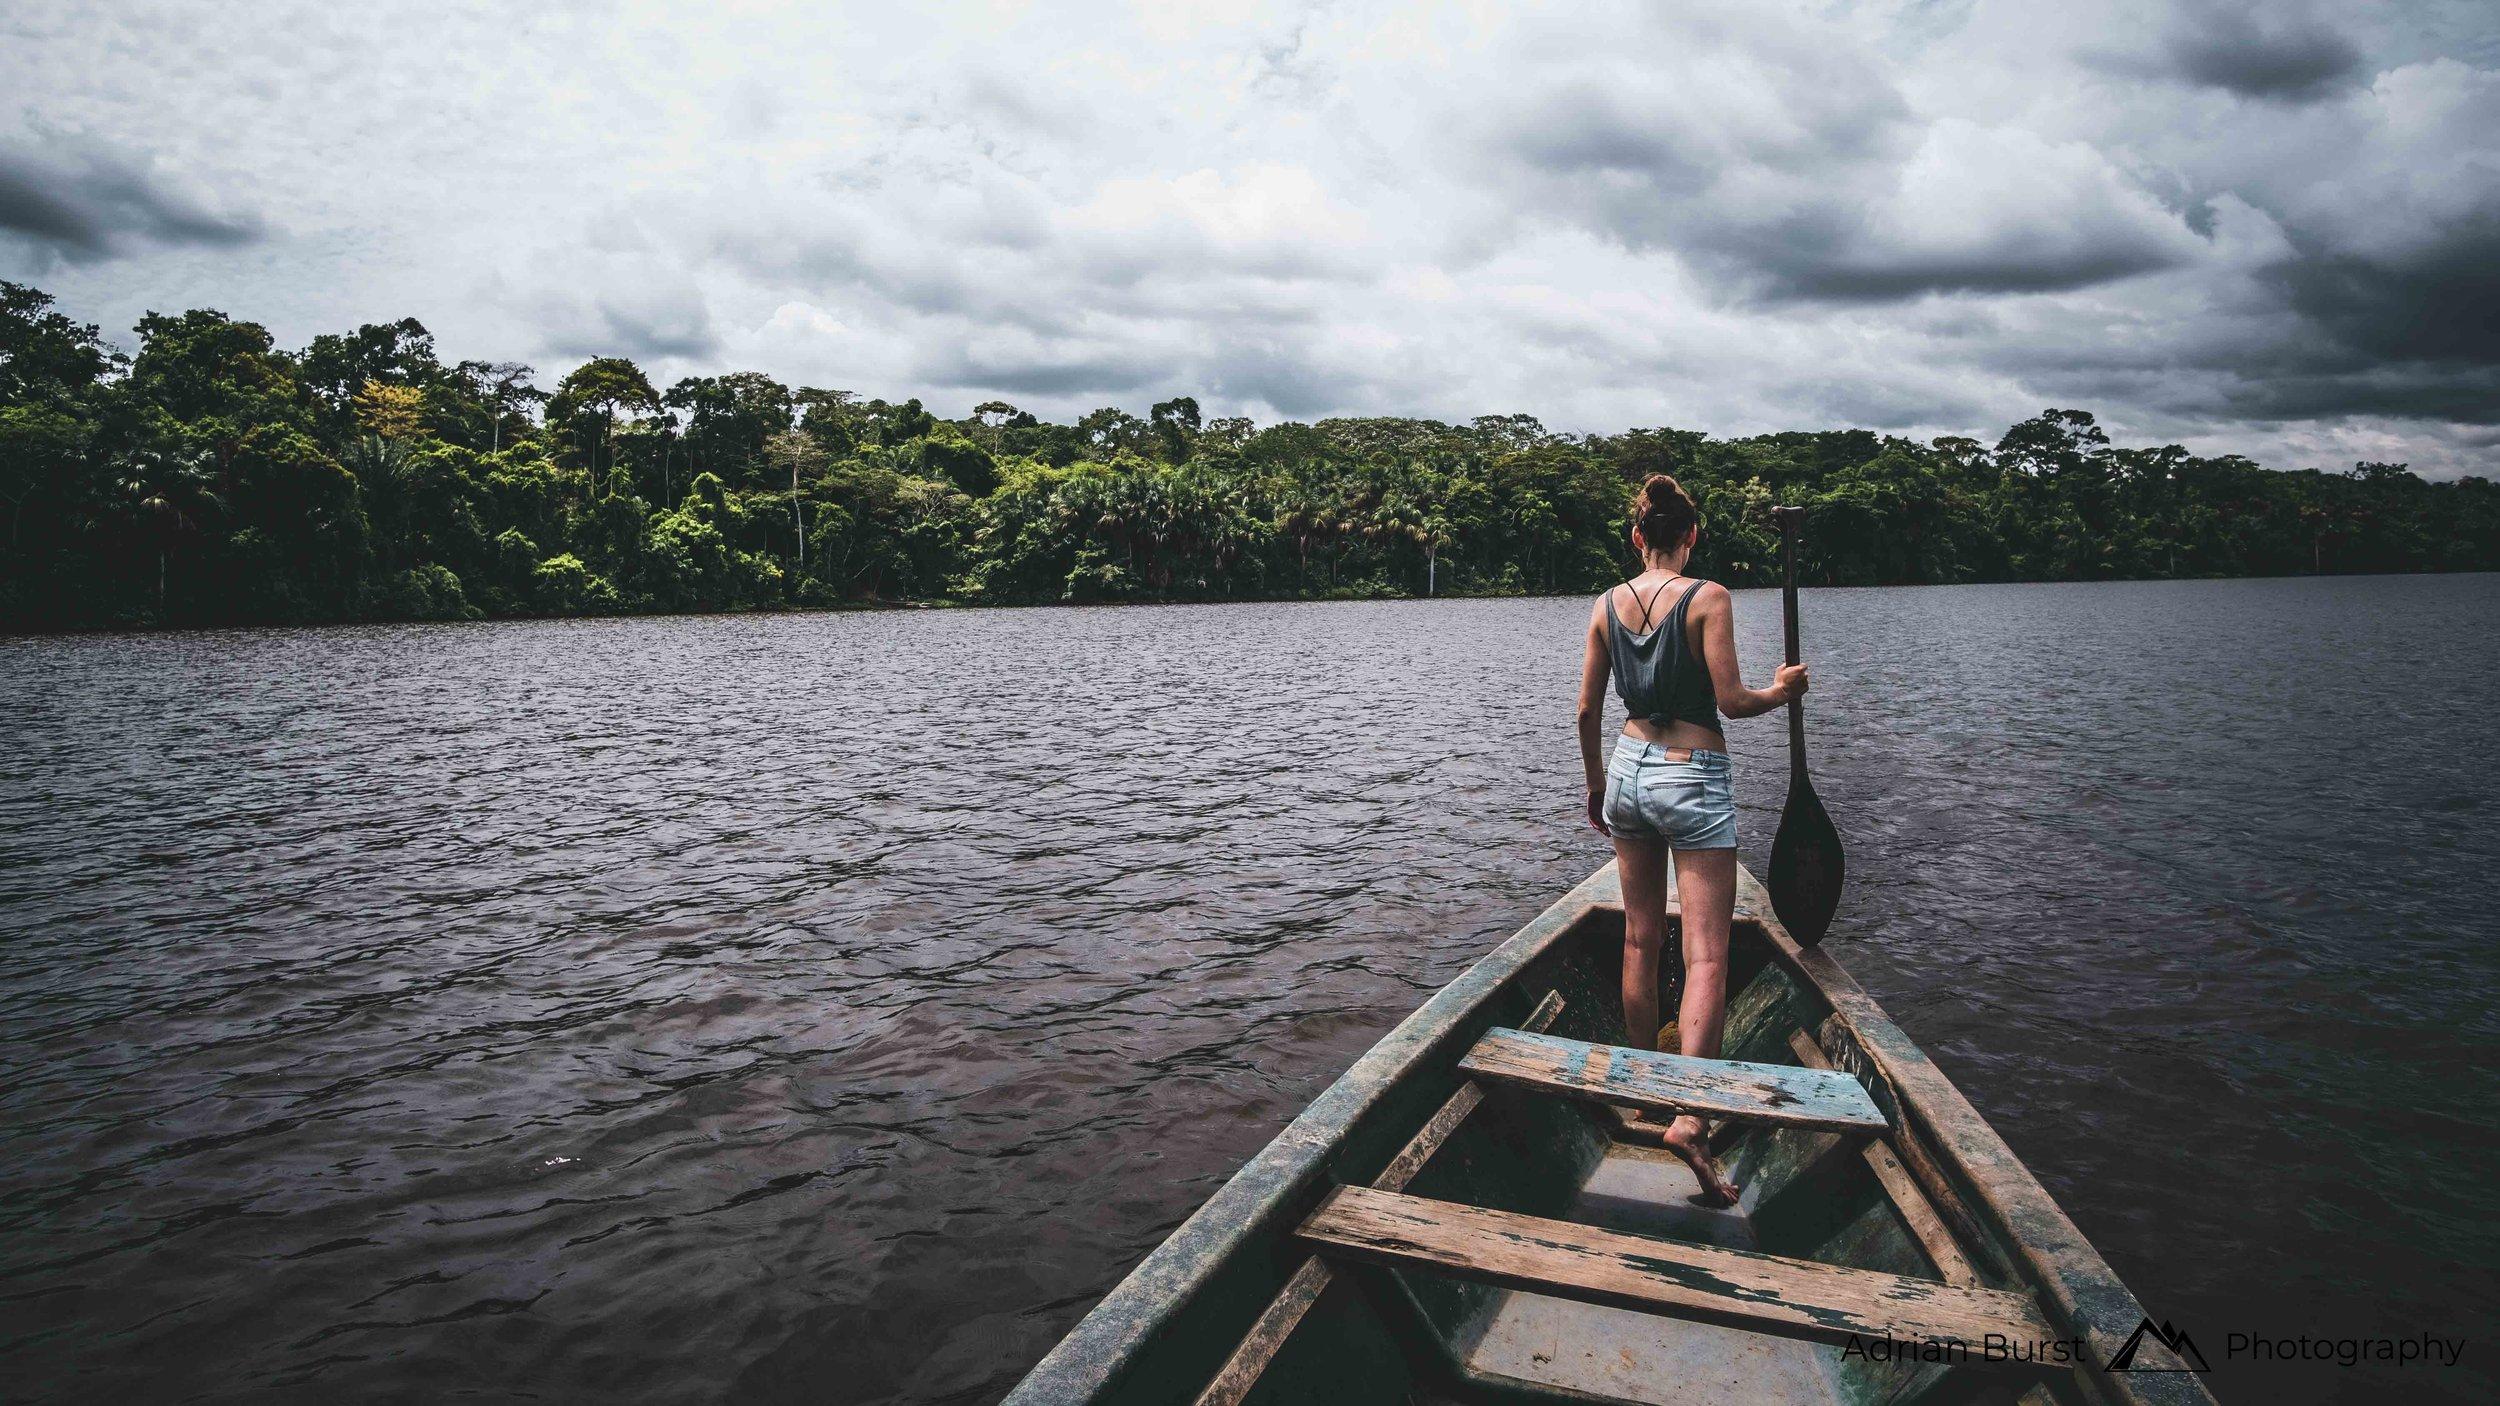 169 | Lake Sandoval, Tambopata national reserve